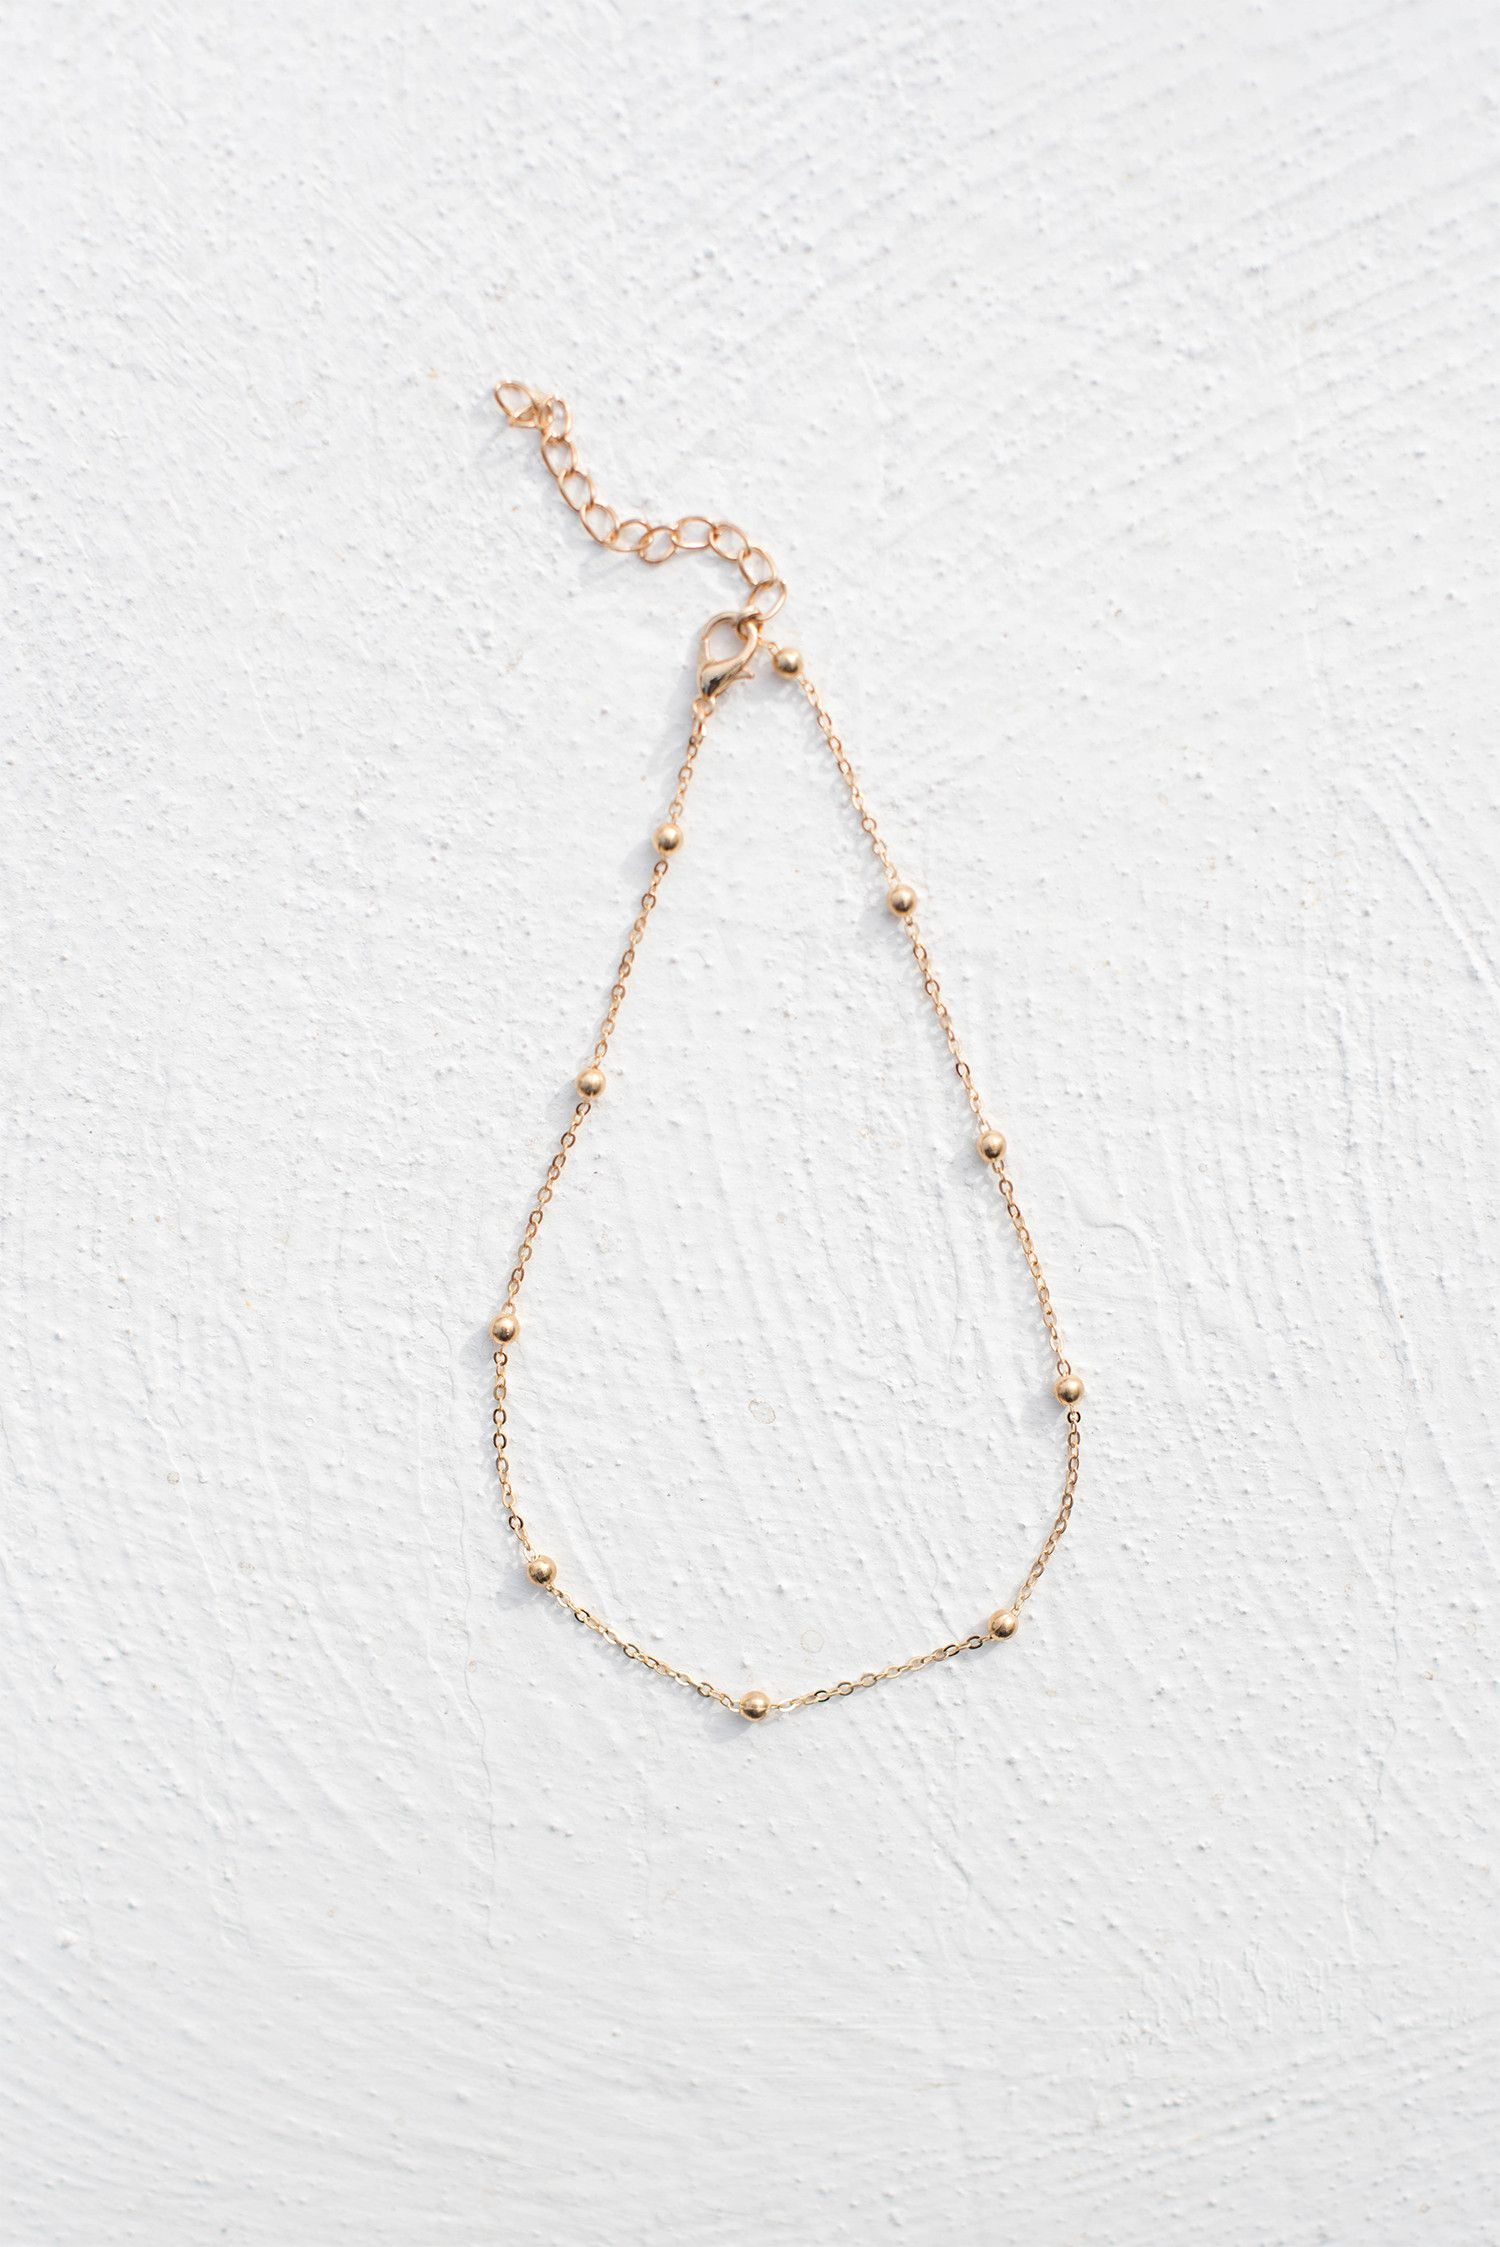 Fine Ball & Chain Choker - Gold – Style Addict